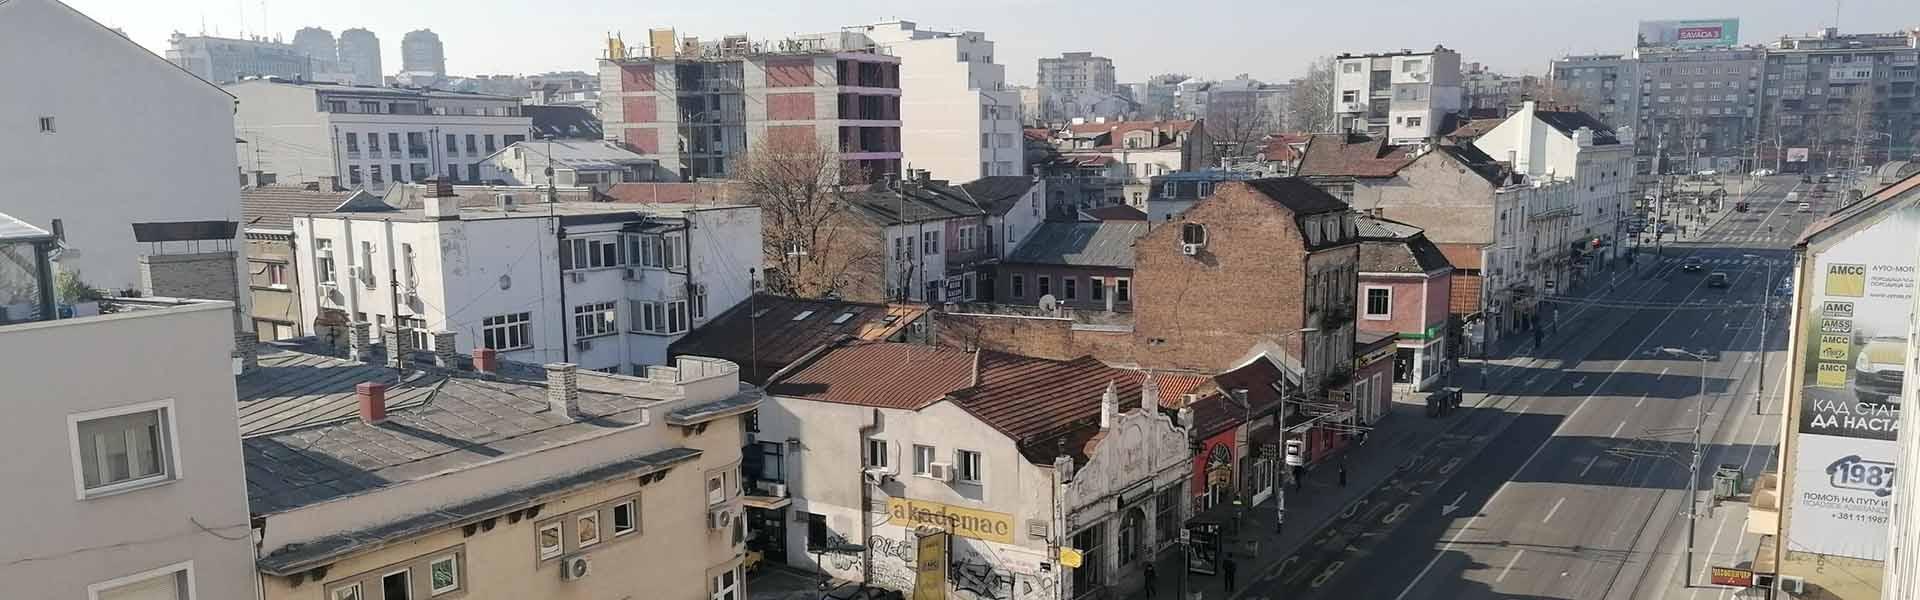 Dostava hrane Bulevar Despota Stefana | Beograd